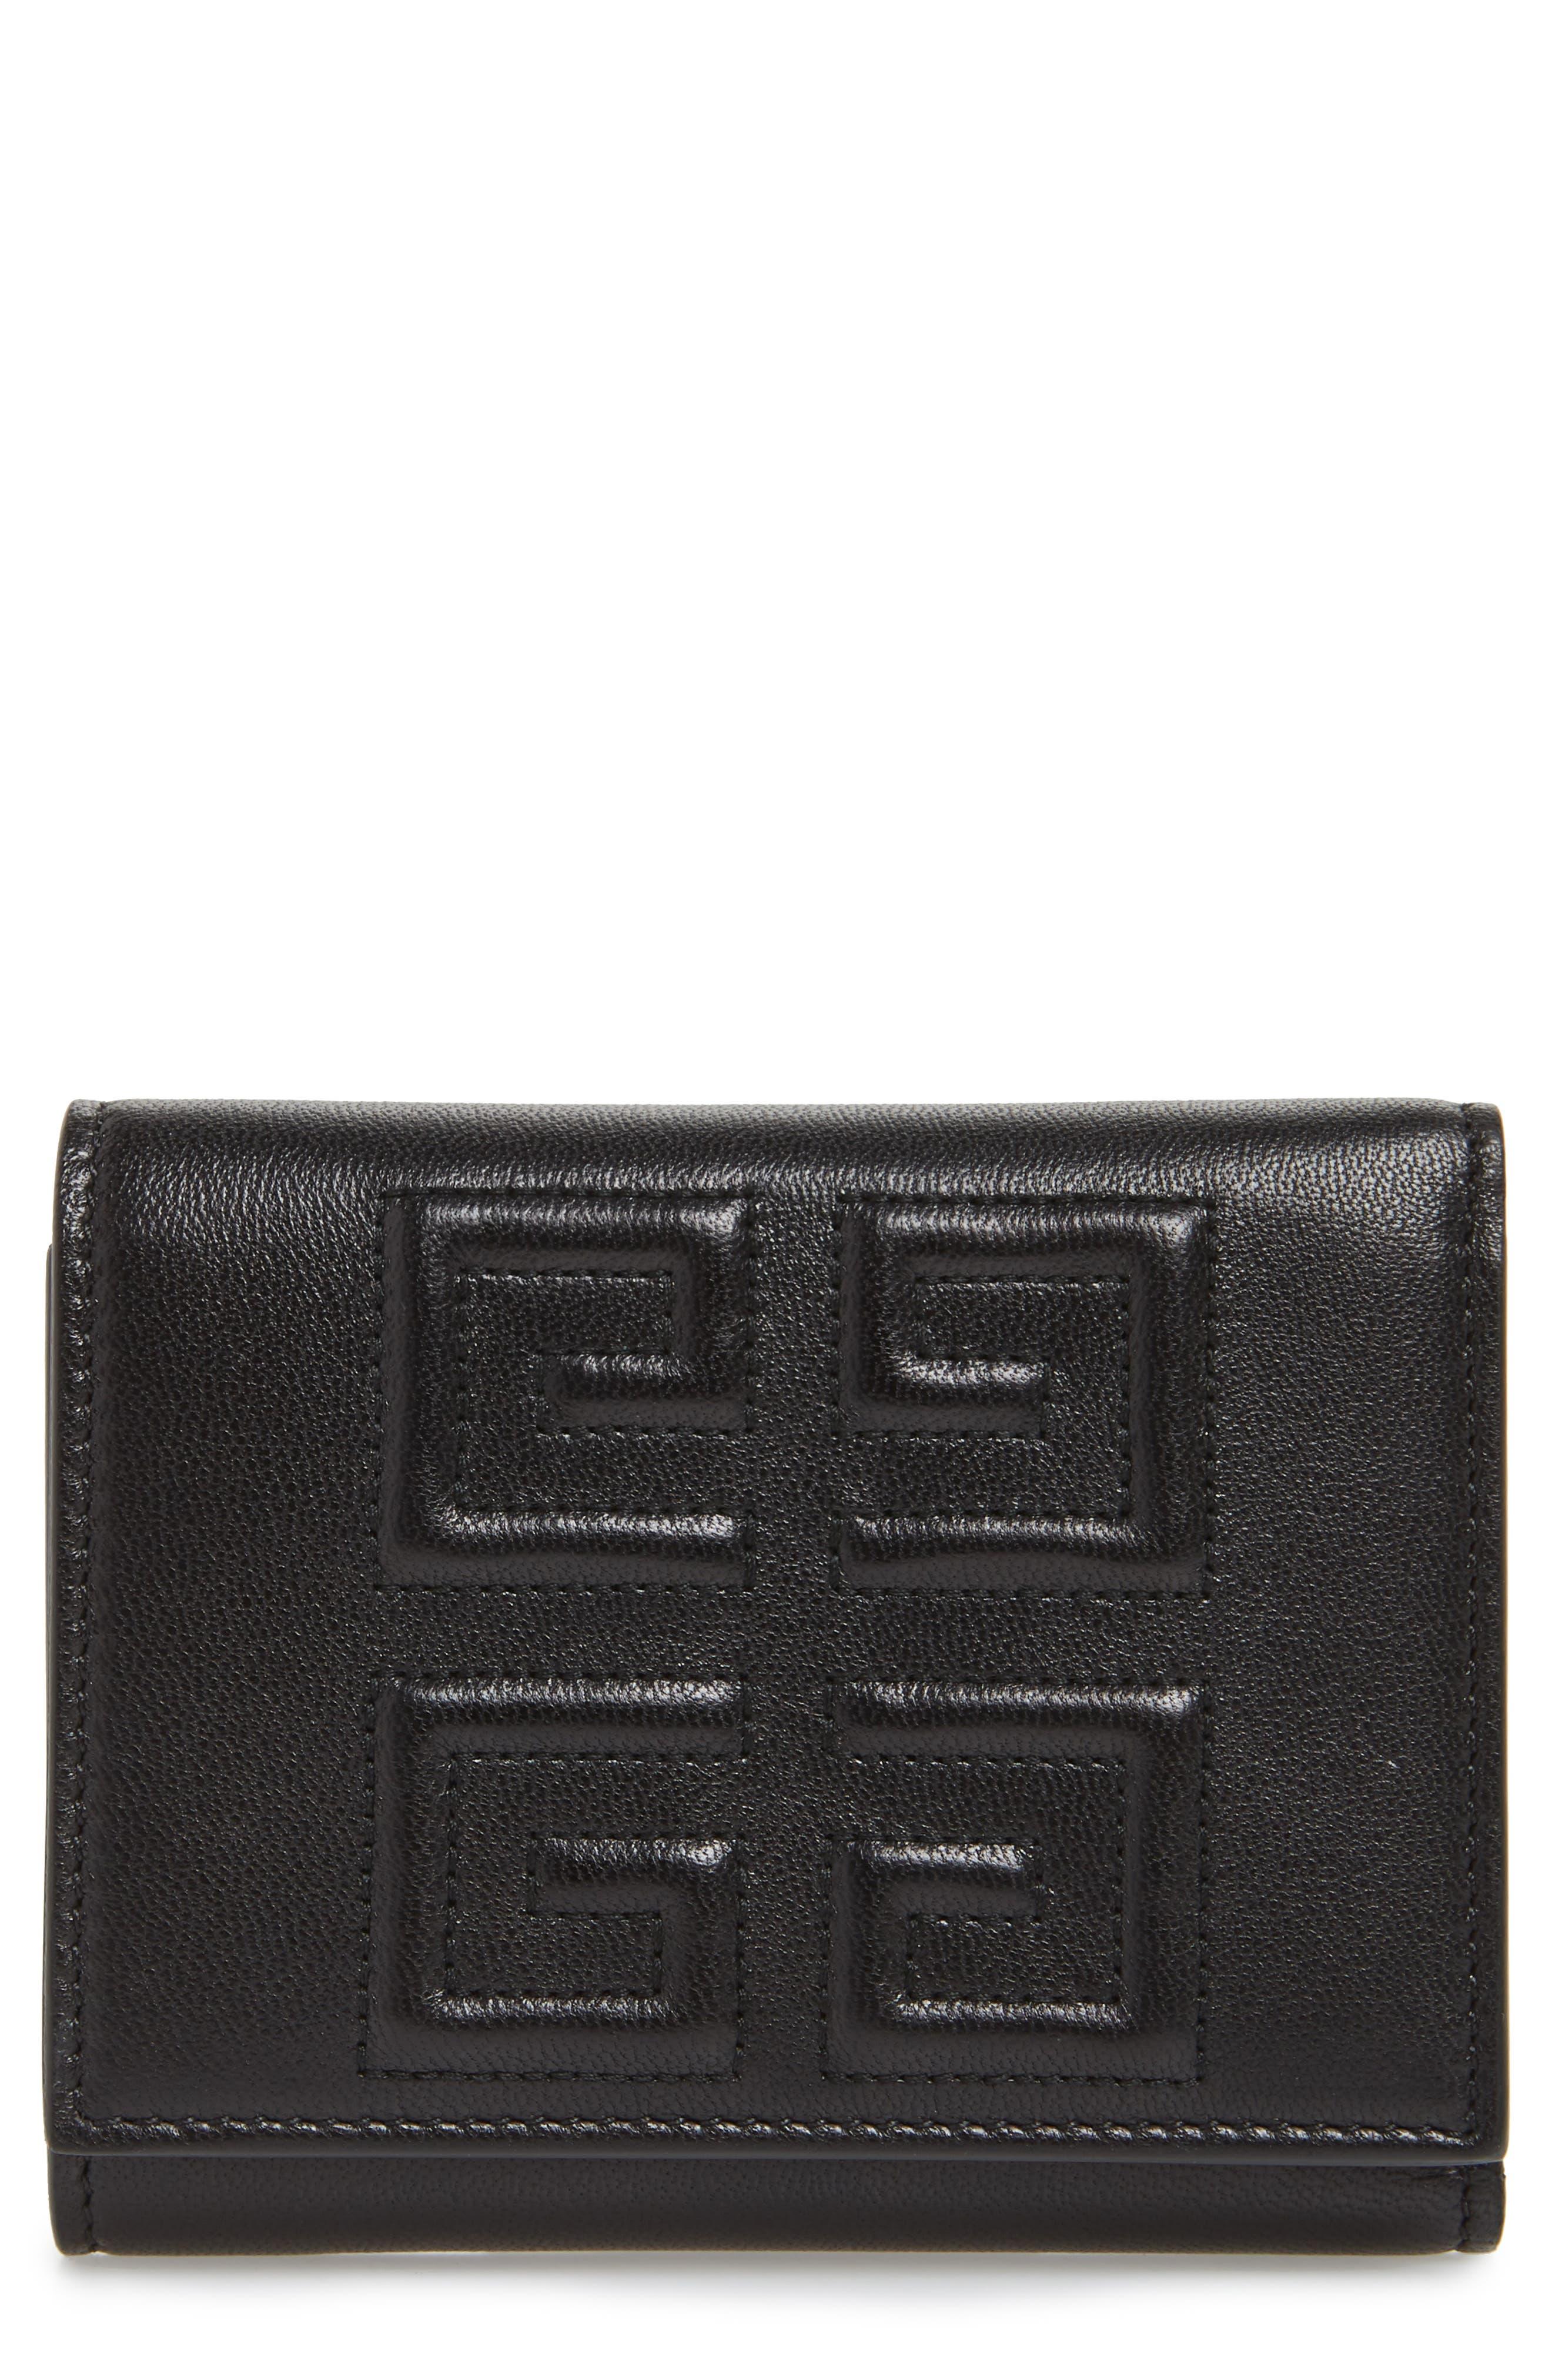 Emblem Lambskin Leather Trifold Wallet,                             Main thumbnail 1, color,                             BLACK